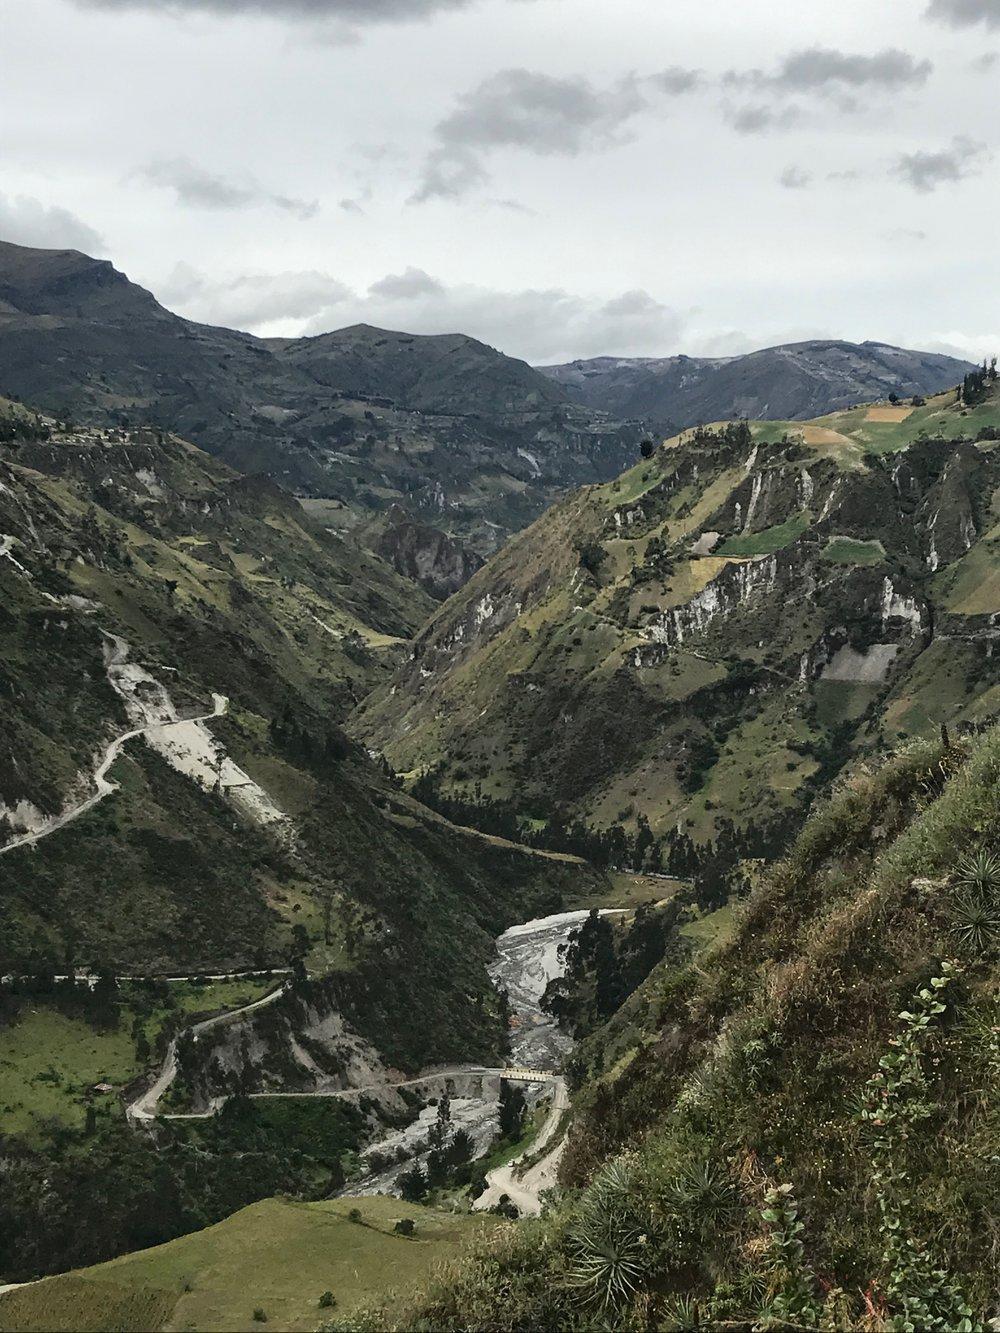 Vistas on the trek to Quilotoa